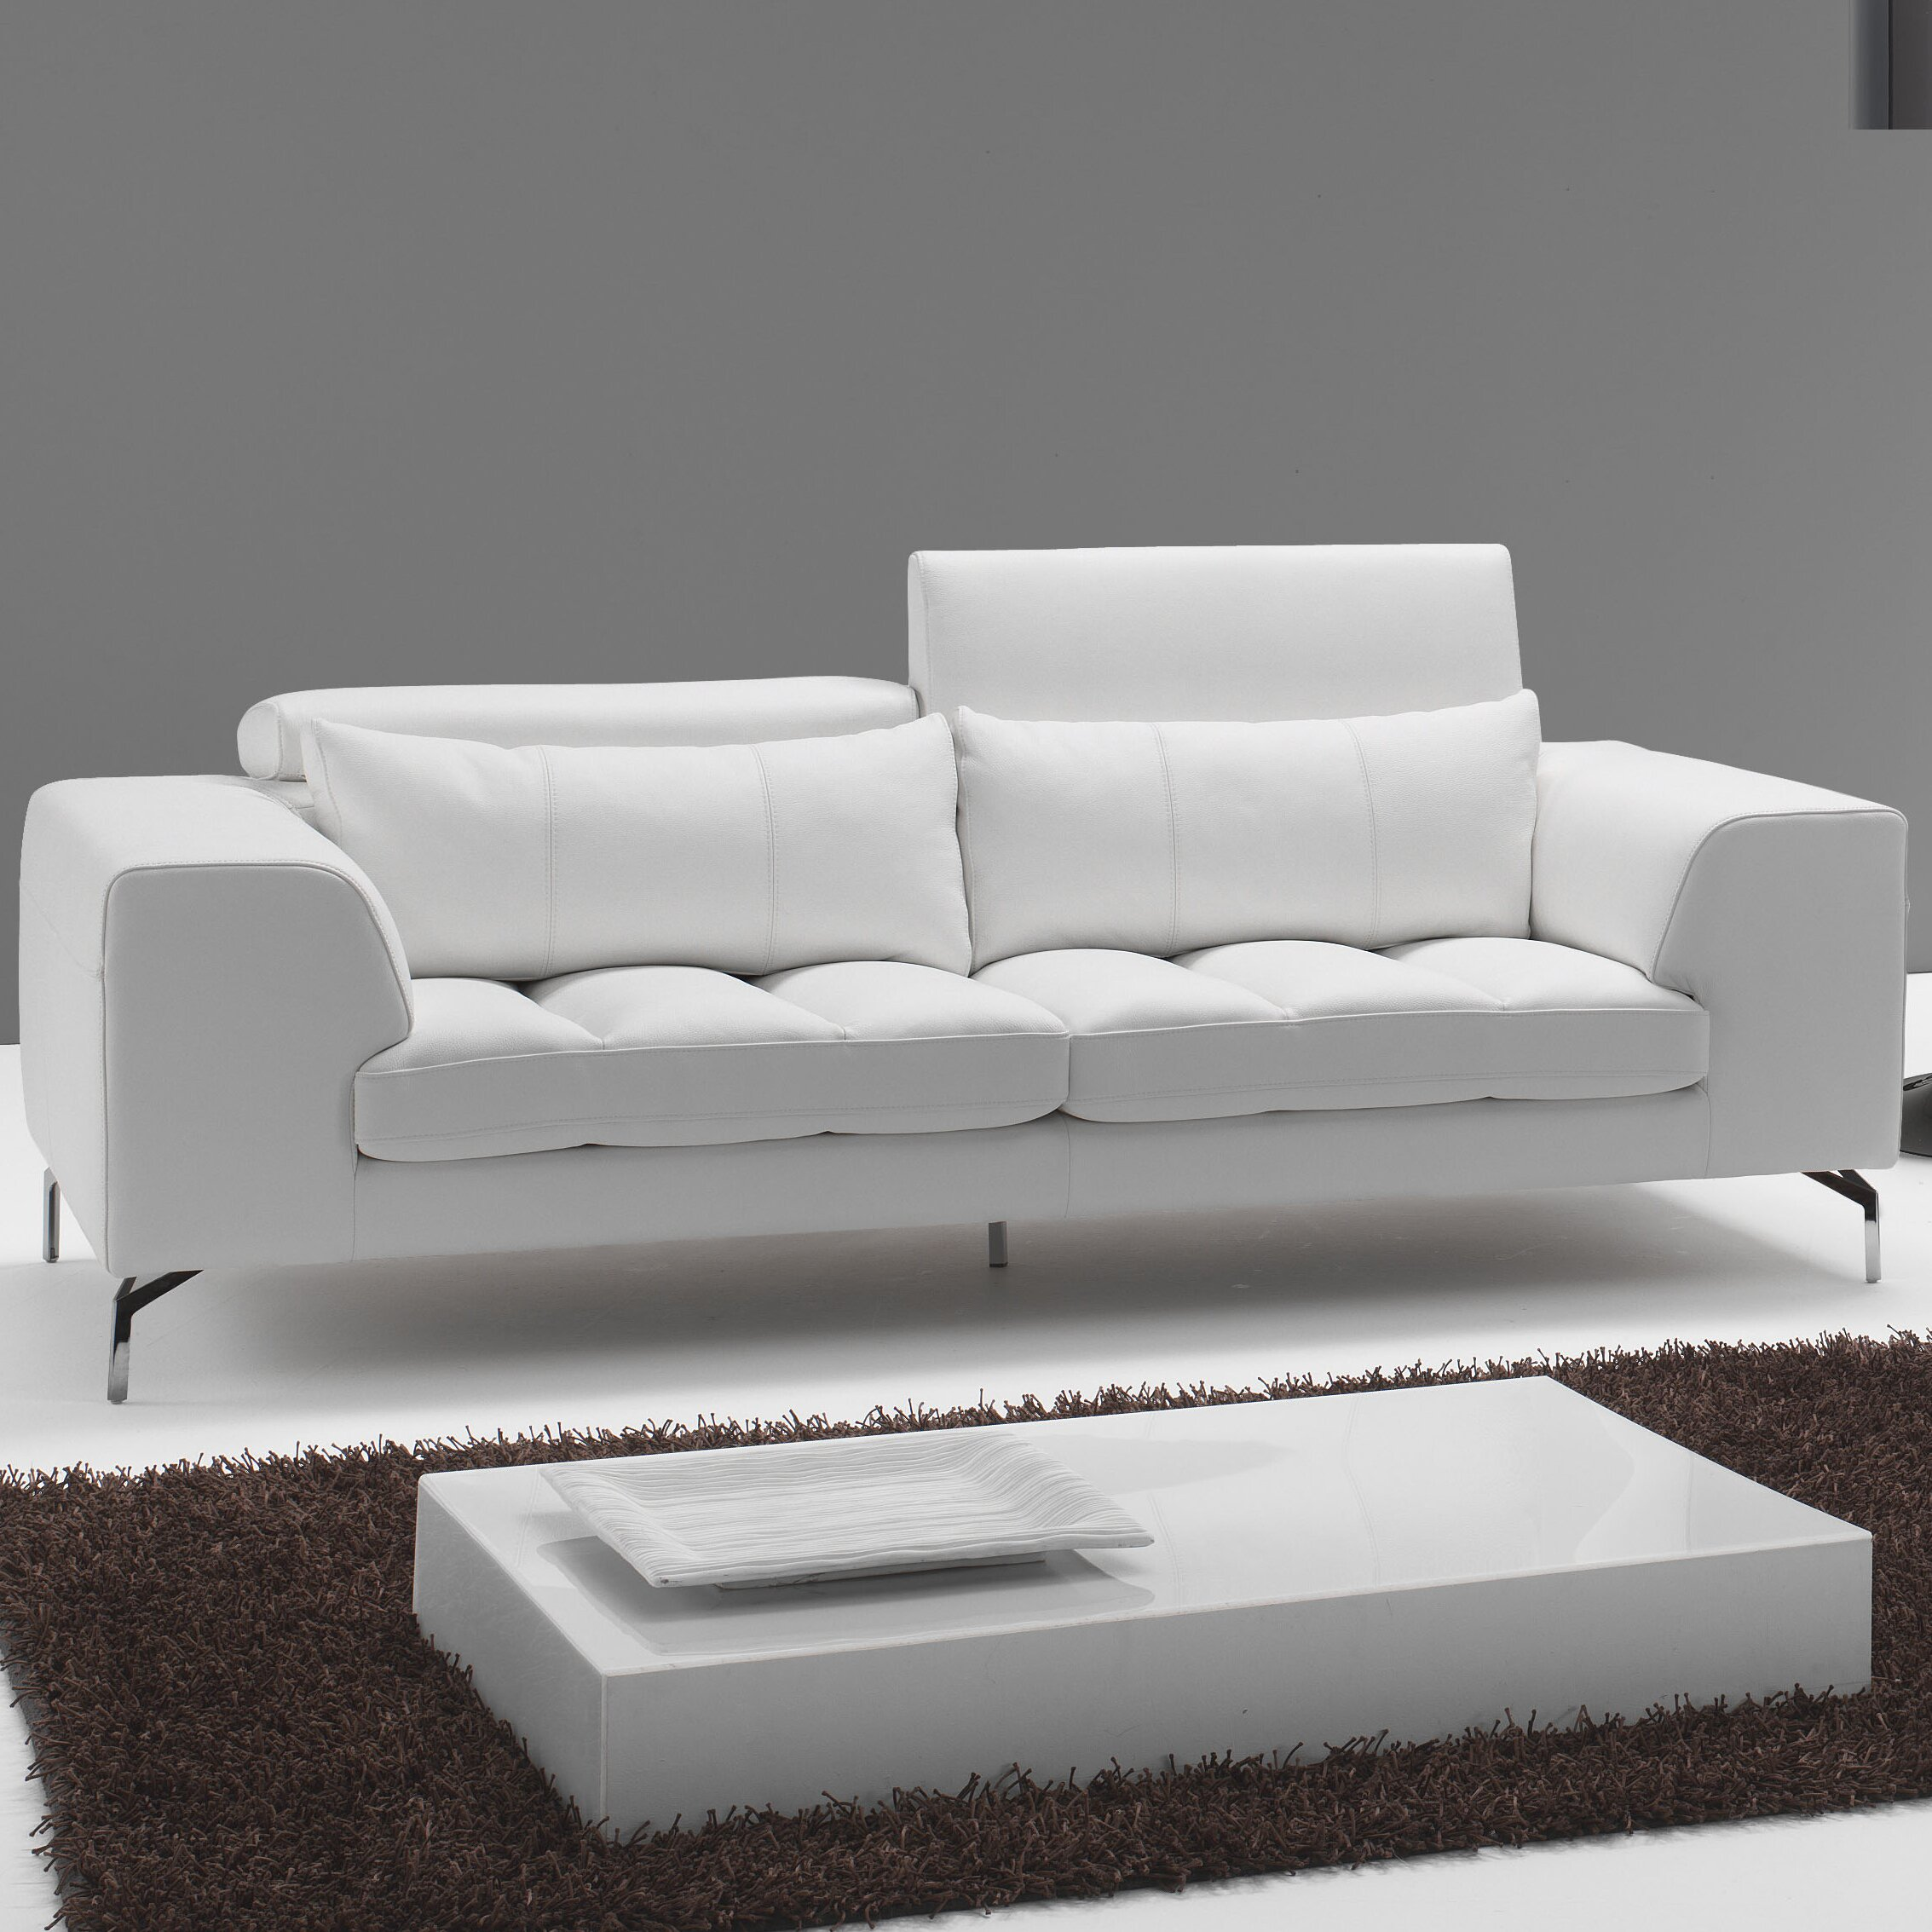 Opera Divani Avenue 3 Seater Modular Sofa & Reviews ...